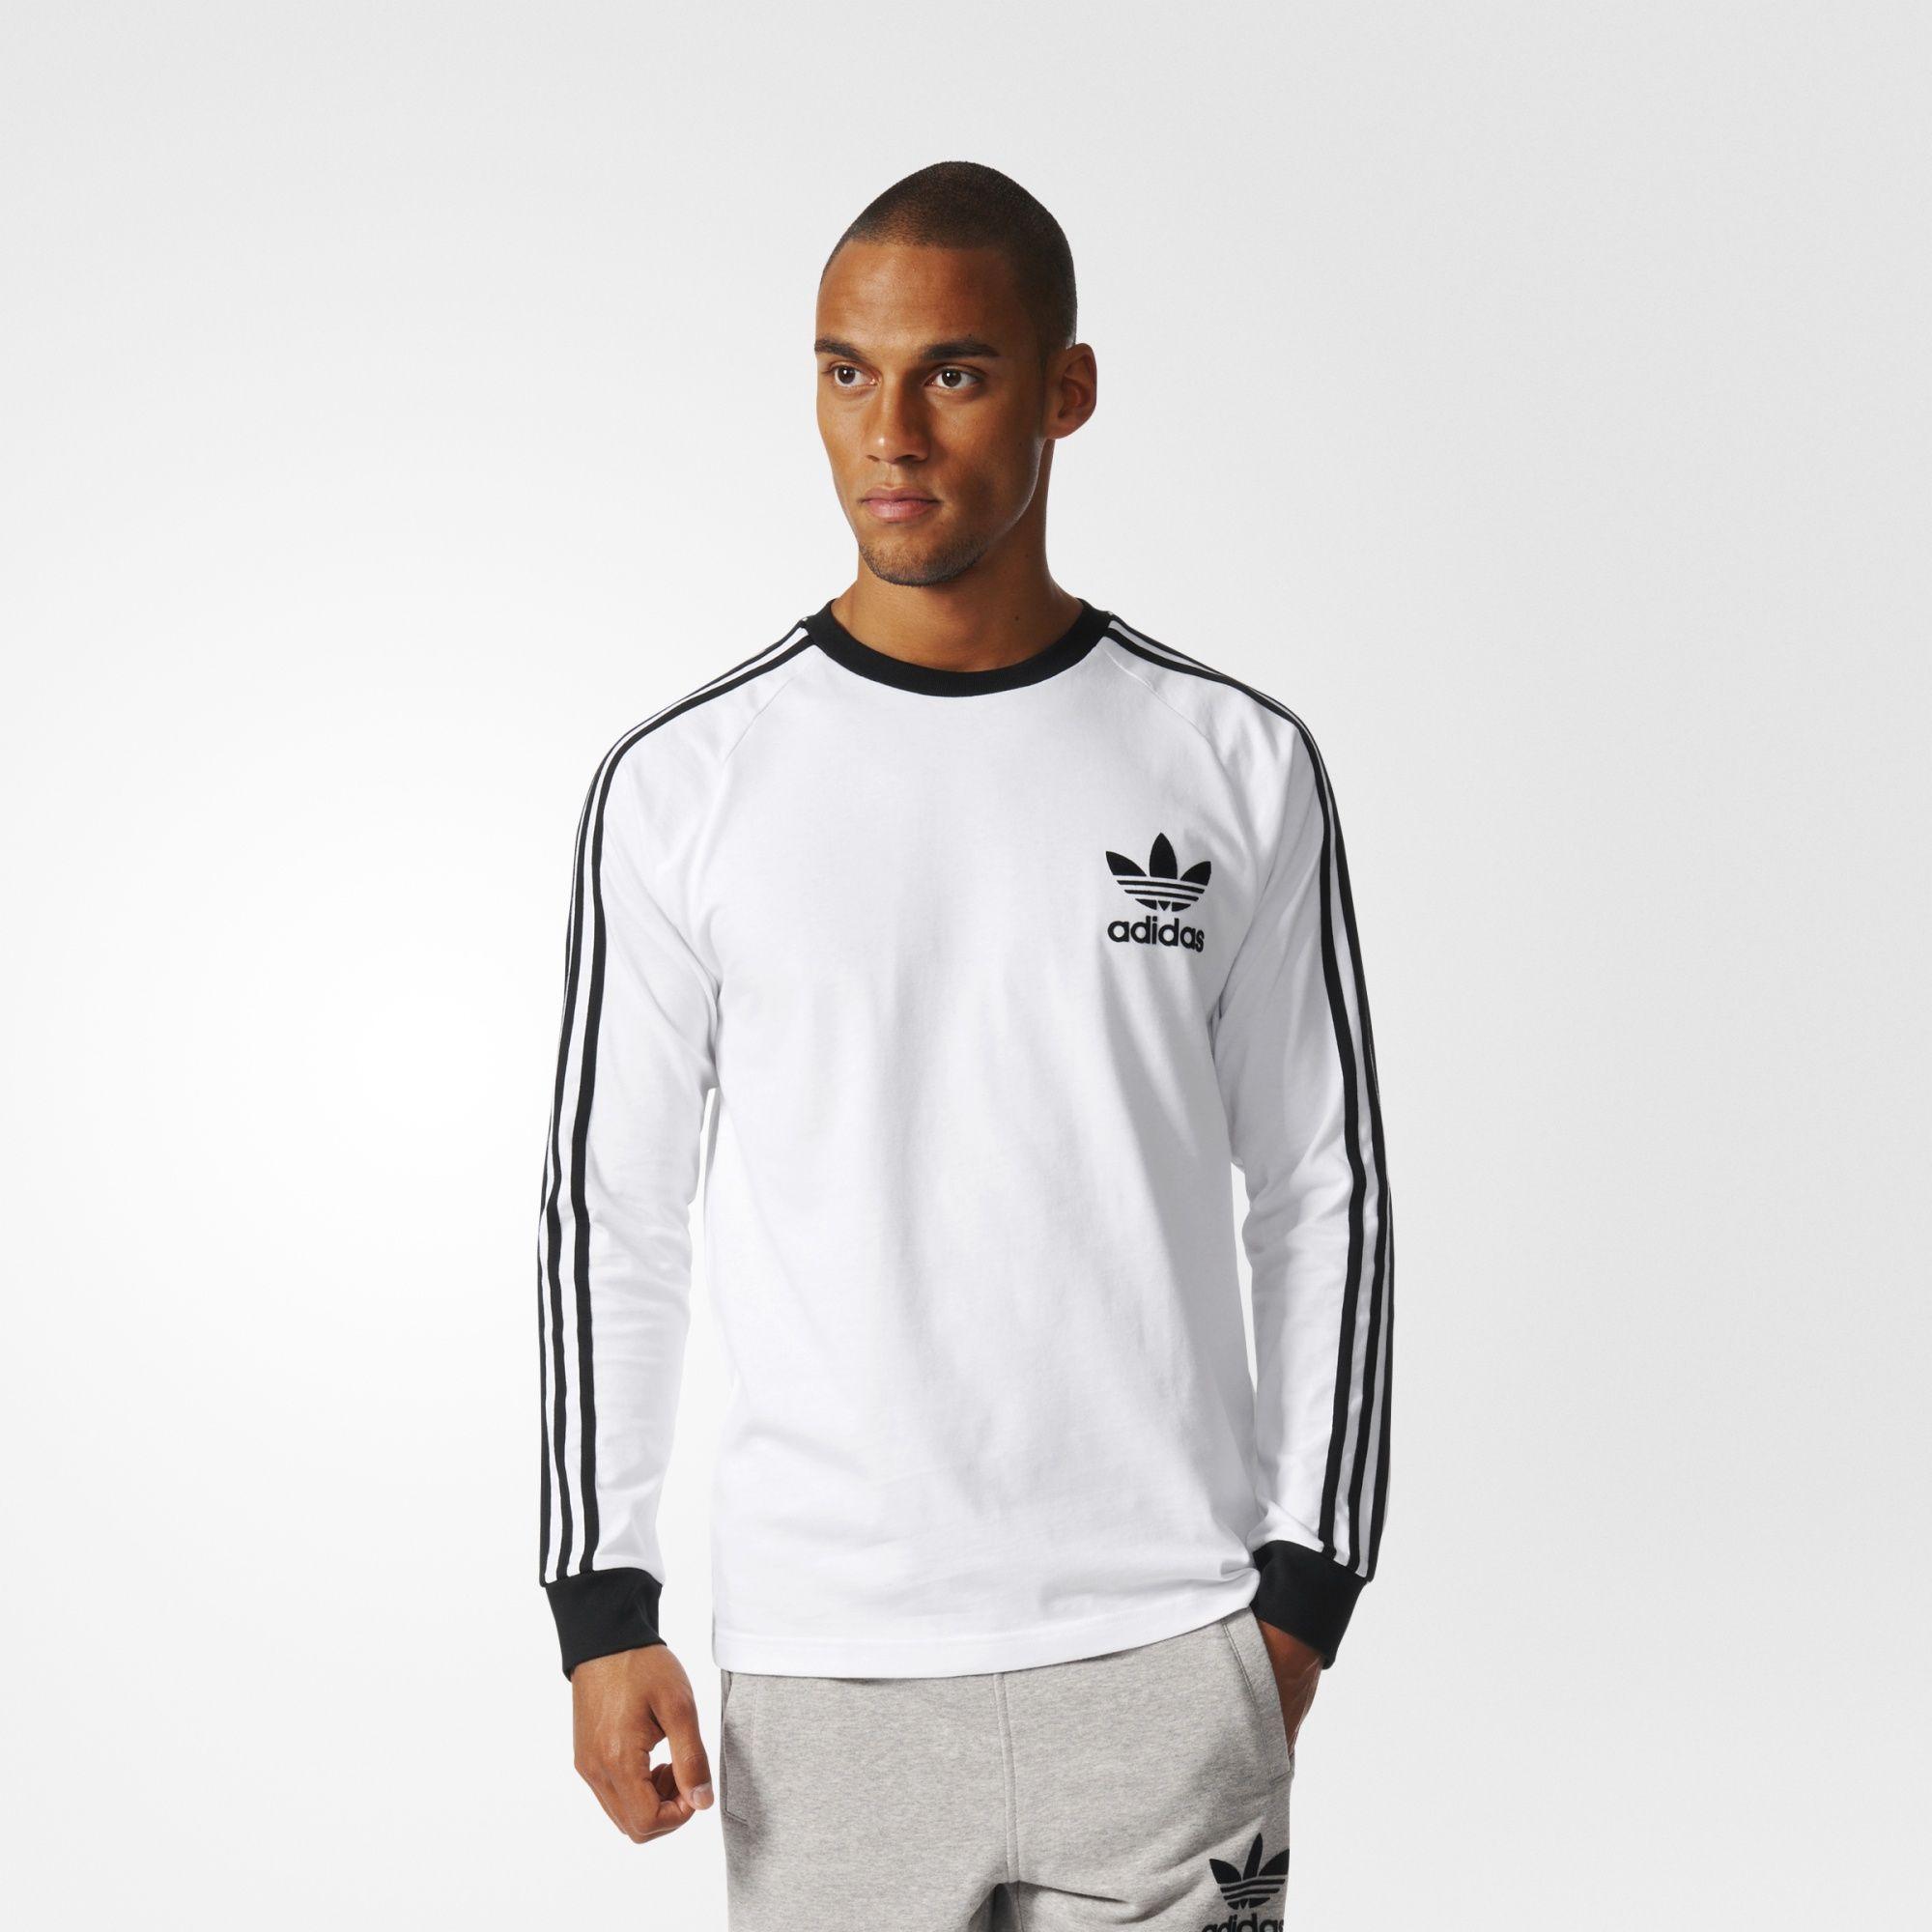 New Zealand Medium Grey Heather Equipment Blue - adidas Mesh Trefoil T-shirt - Mens Clothing YVD6U47912